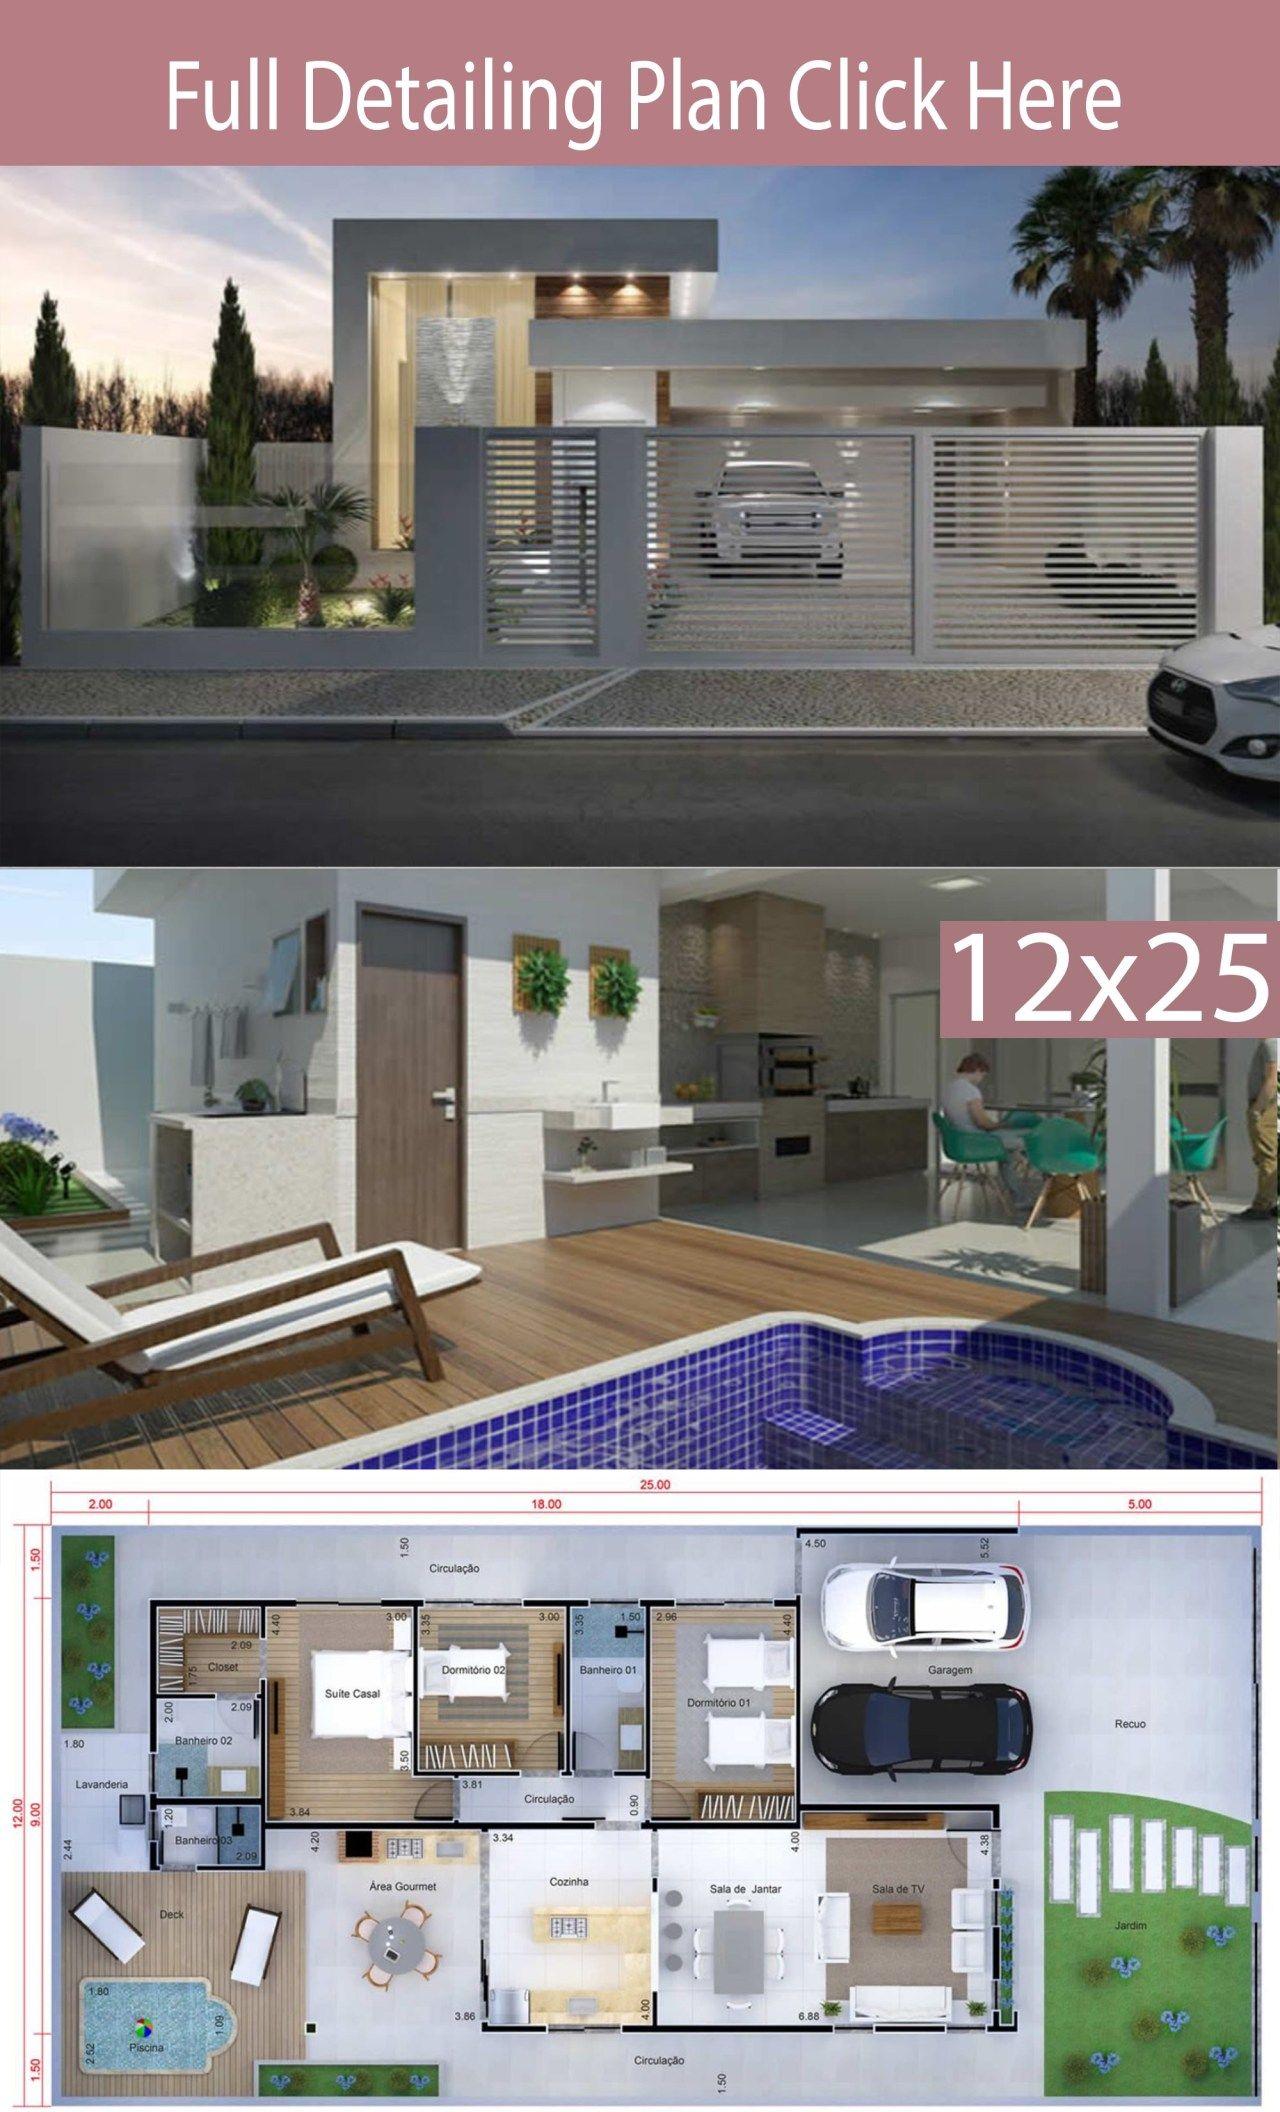 Home Design 12x25 Meters 3 Bedrooms Bungalow House Design Modern House Plans House Design